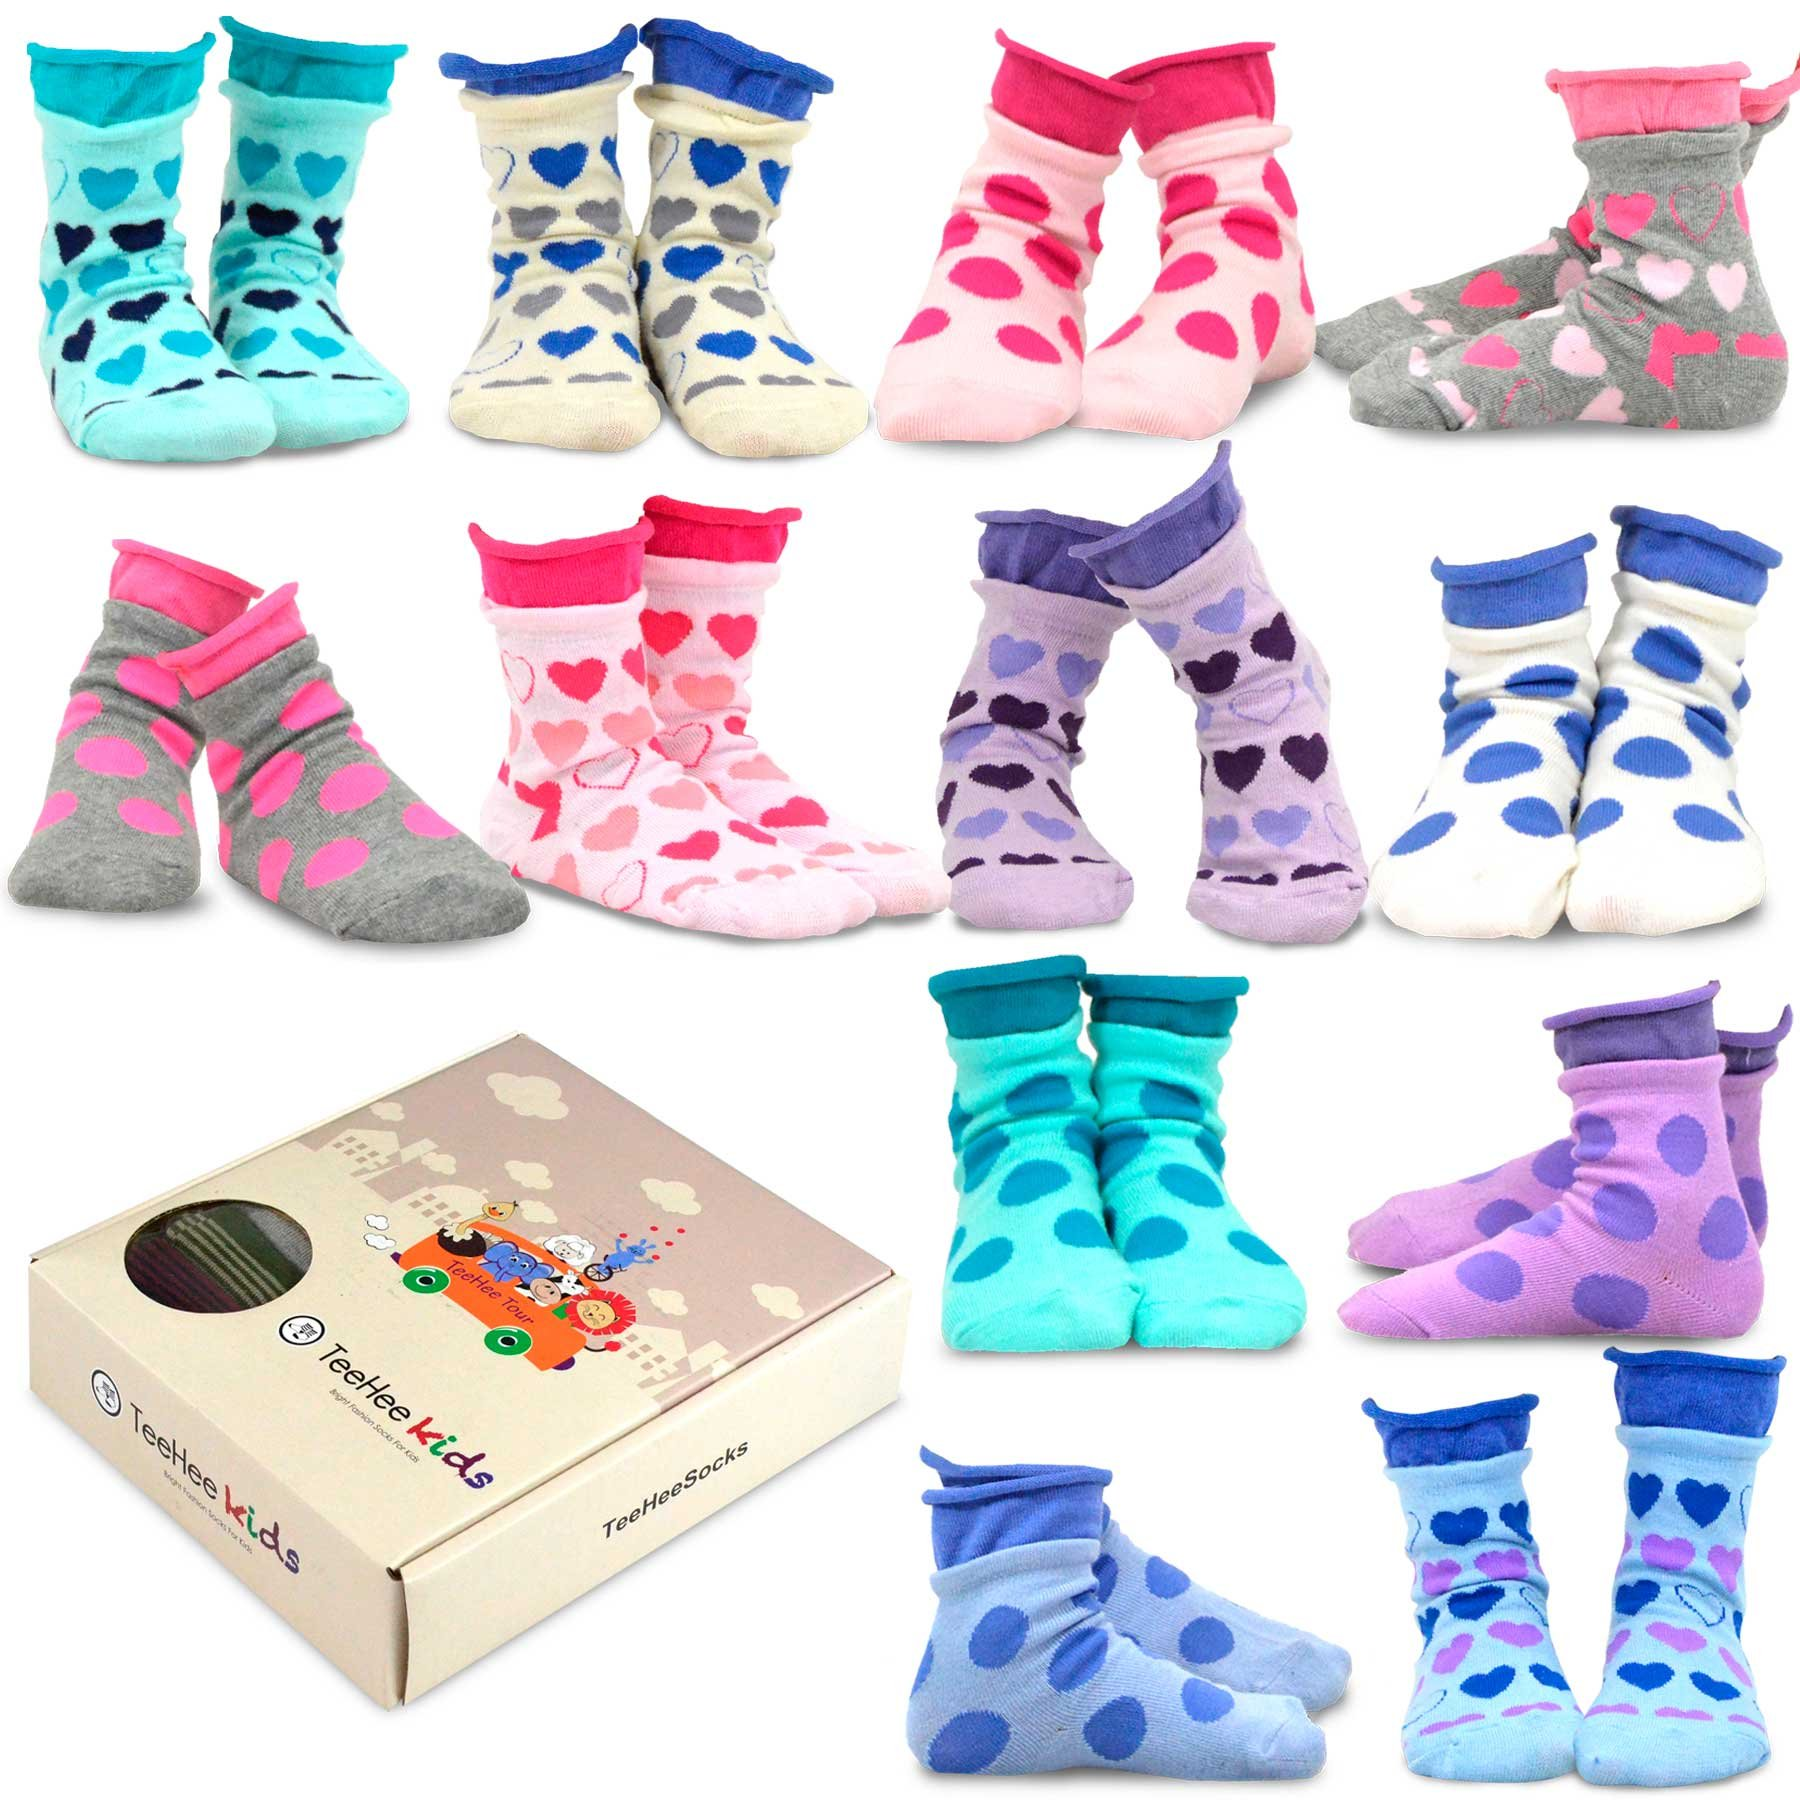 TeeHee Kids Girls Cotton Basic Crew Socks 12 Pair Pack (3-5Y, Large Dot & Hearts)